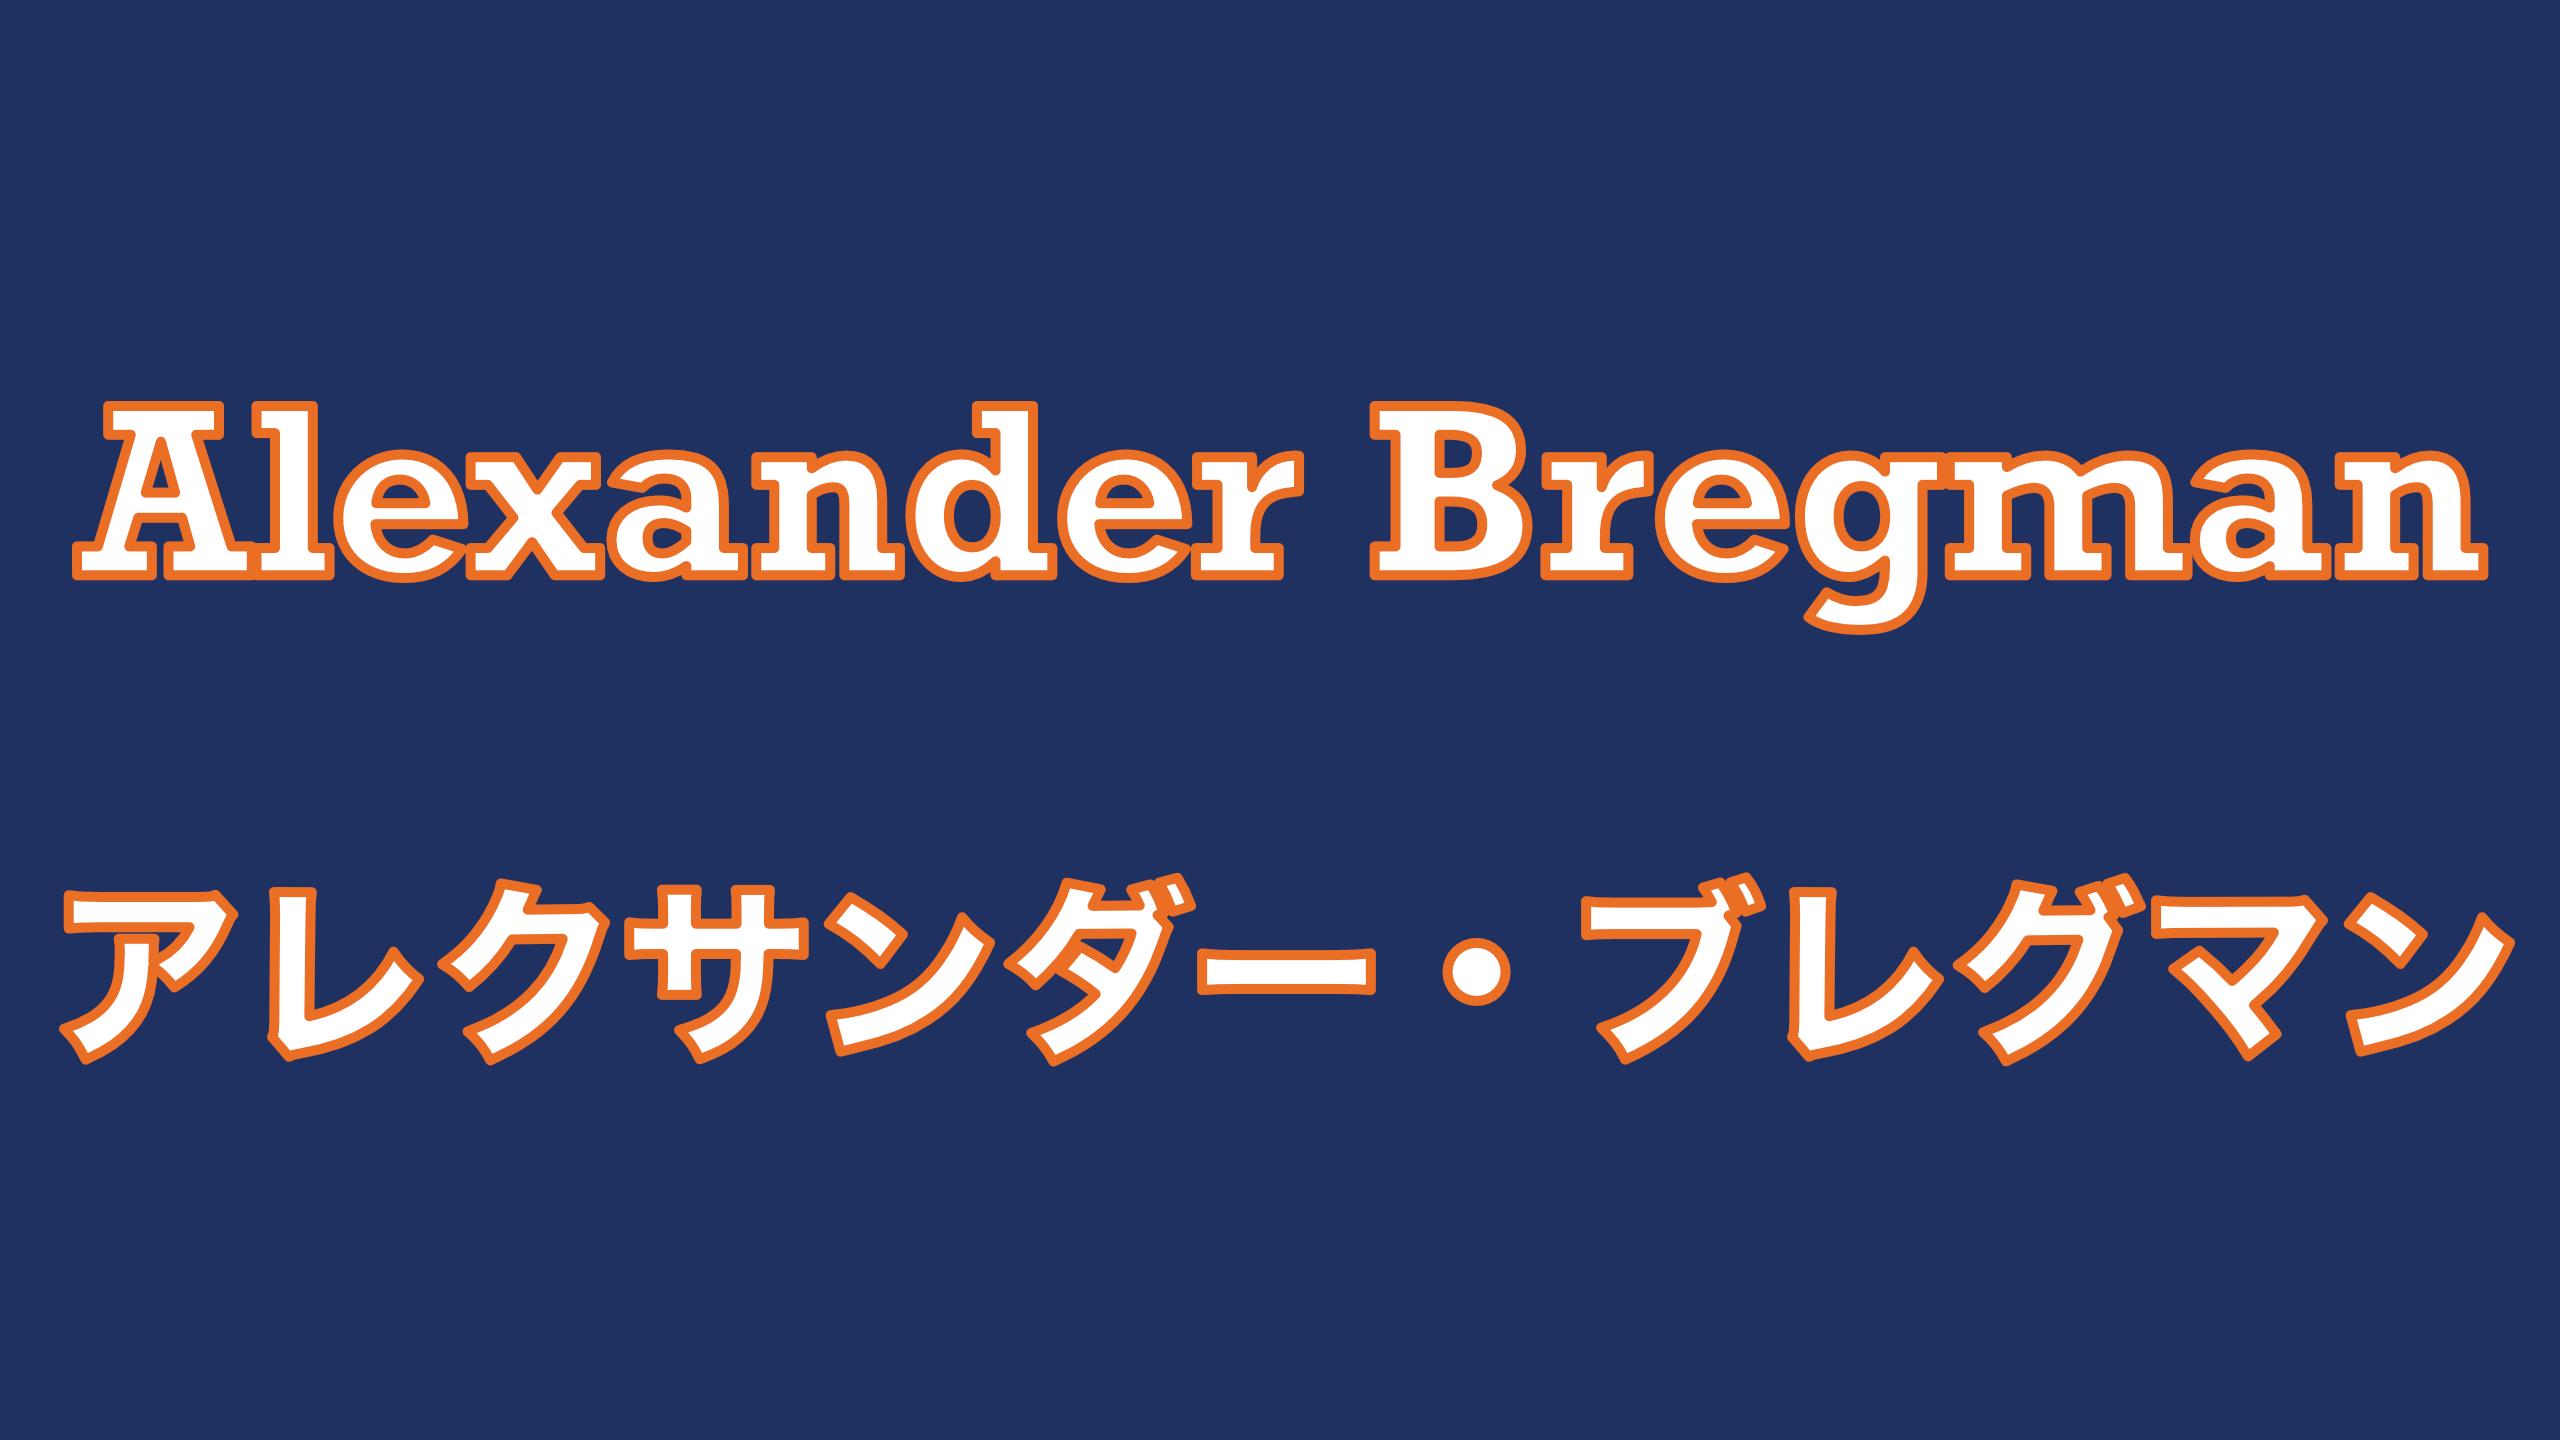 bregman